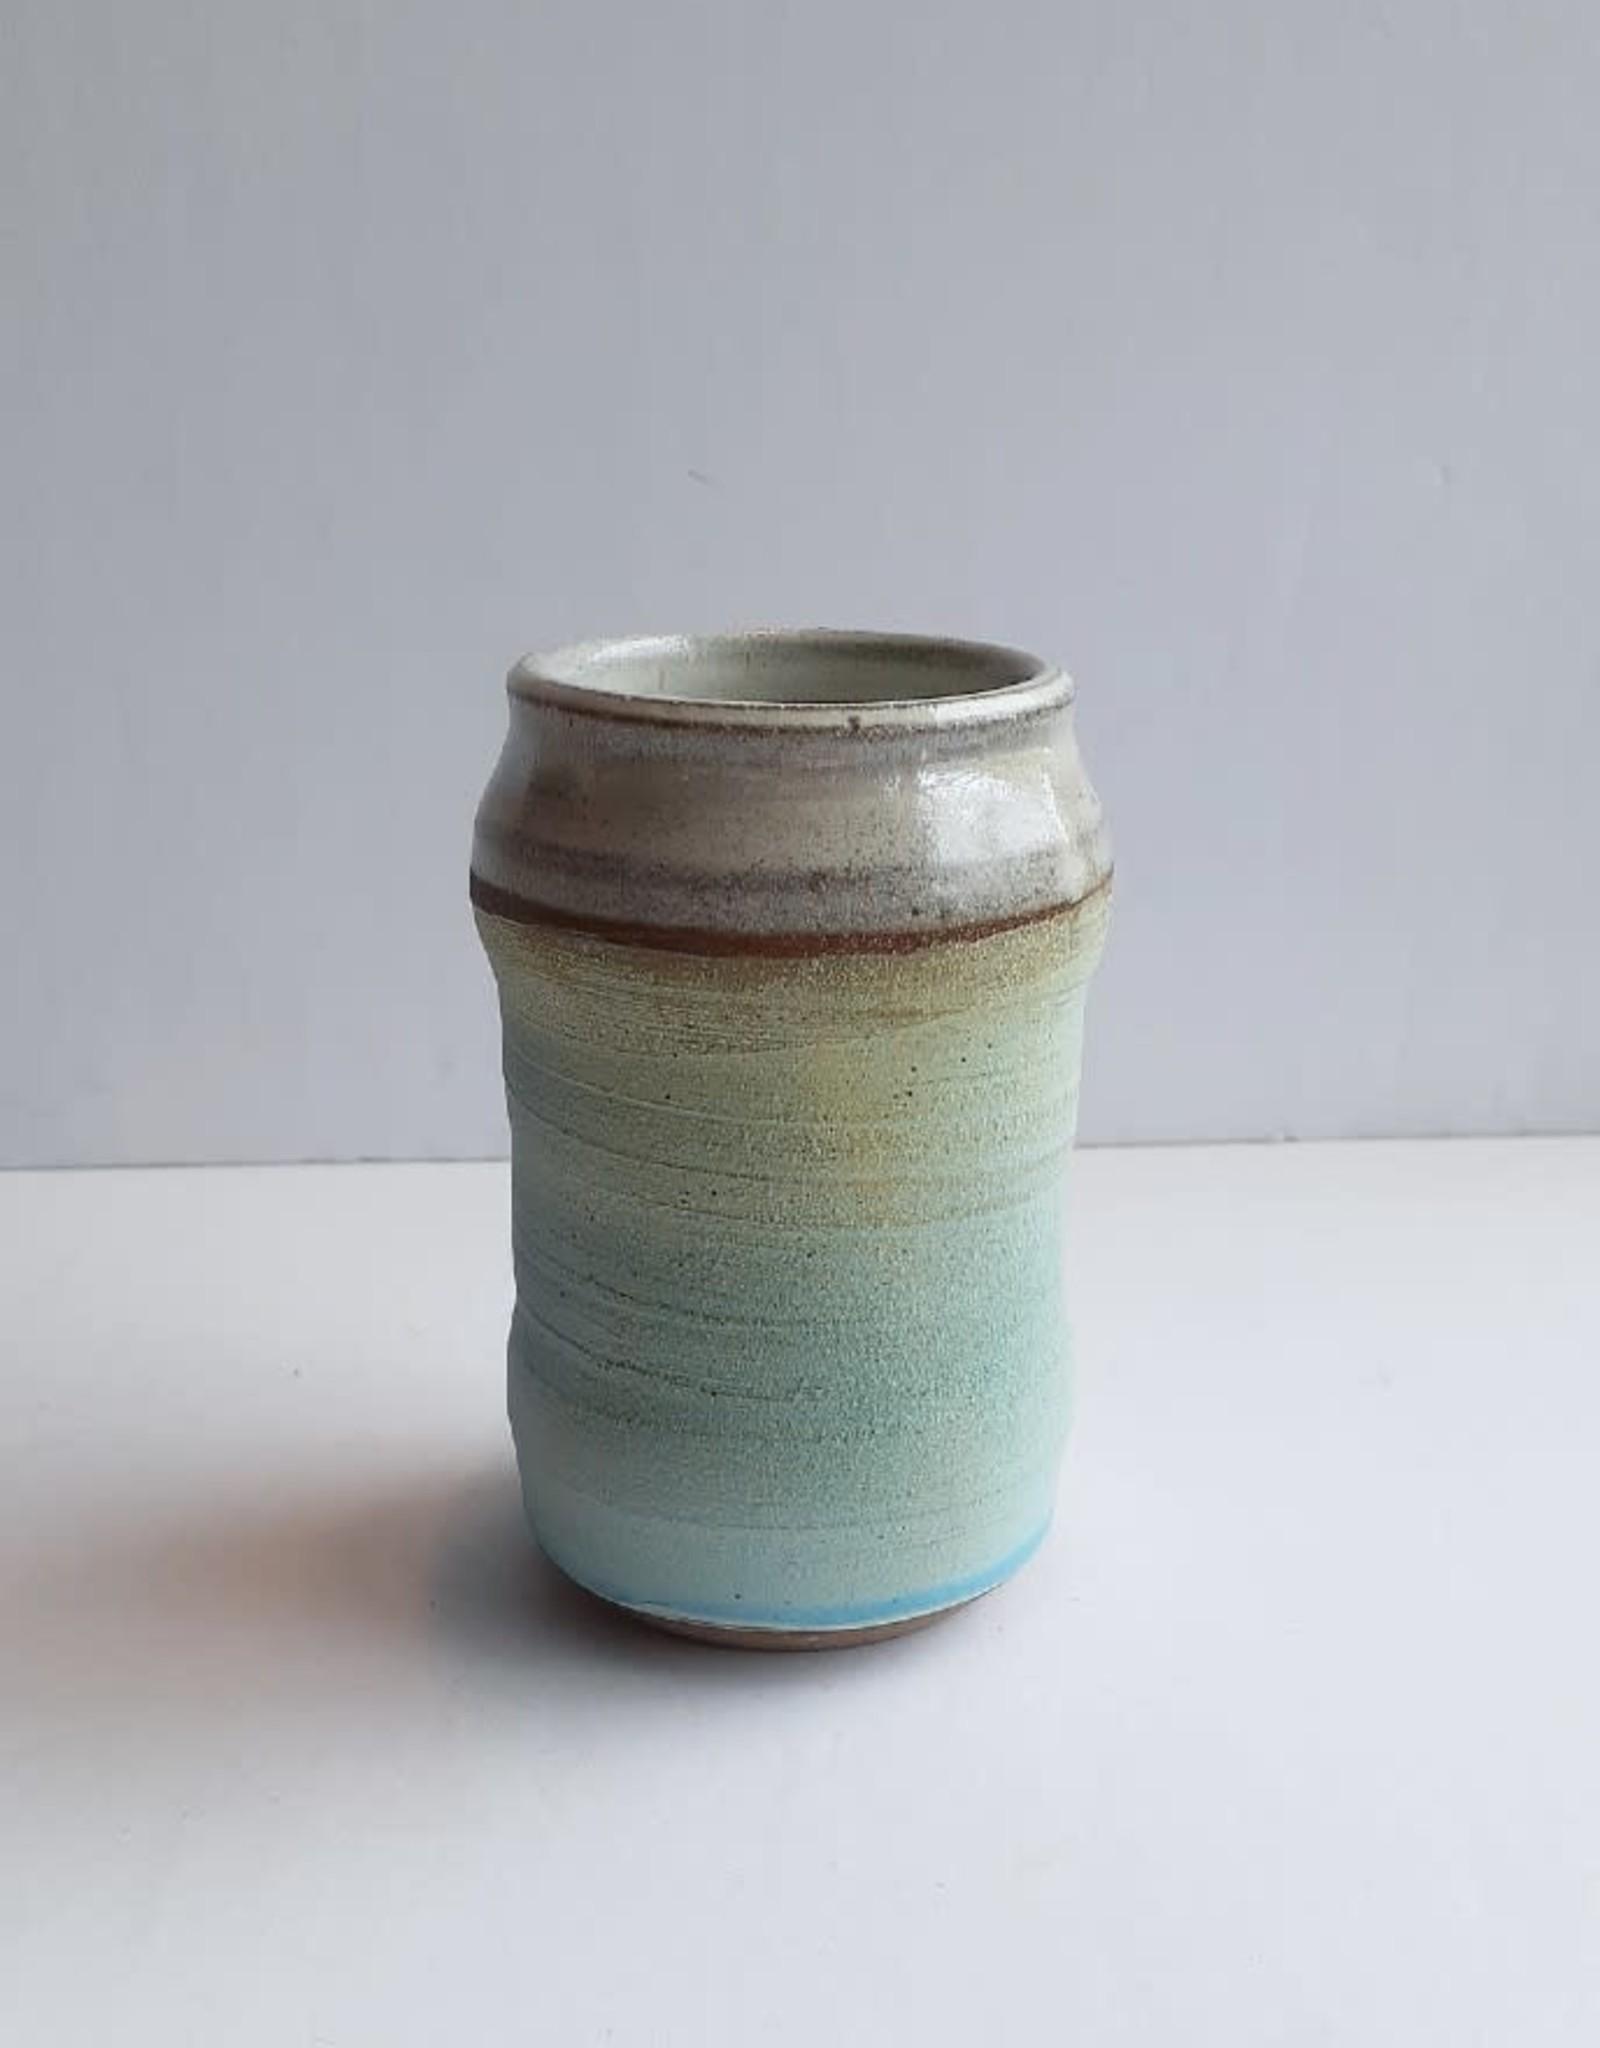 Jacinthe Brind'Amour Mini Vase 2 Jacinthe Brind'Amour